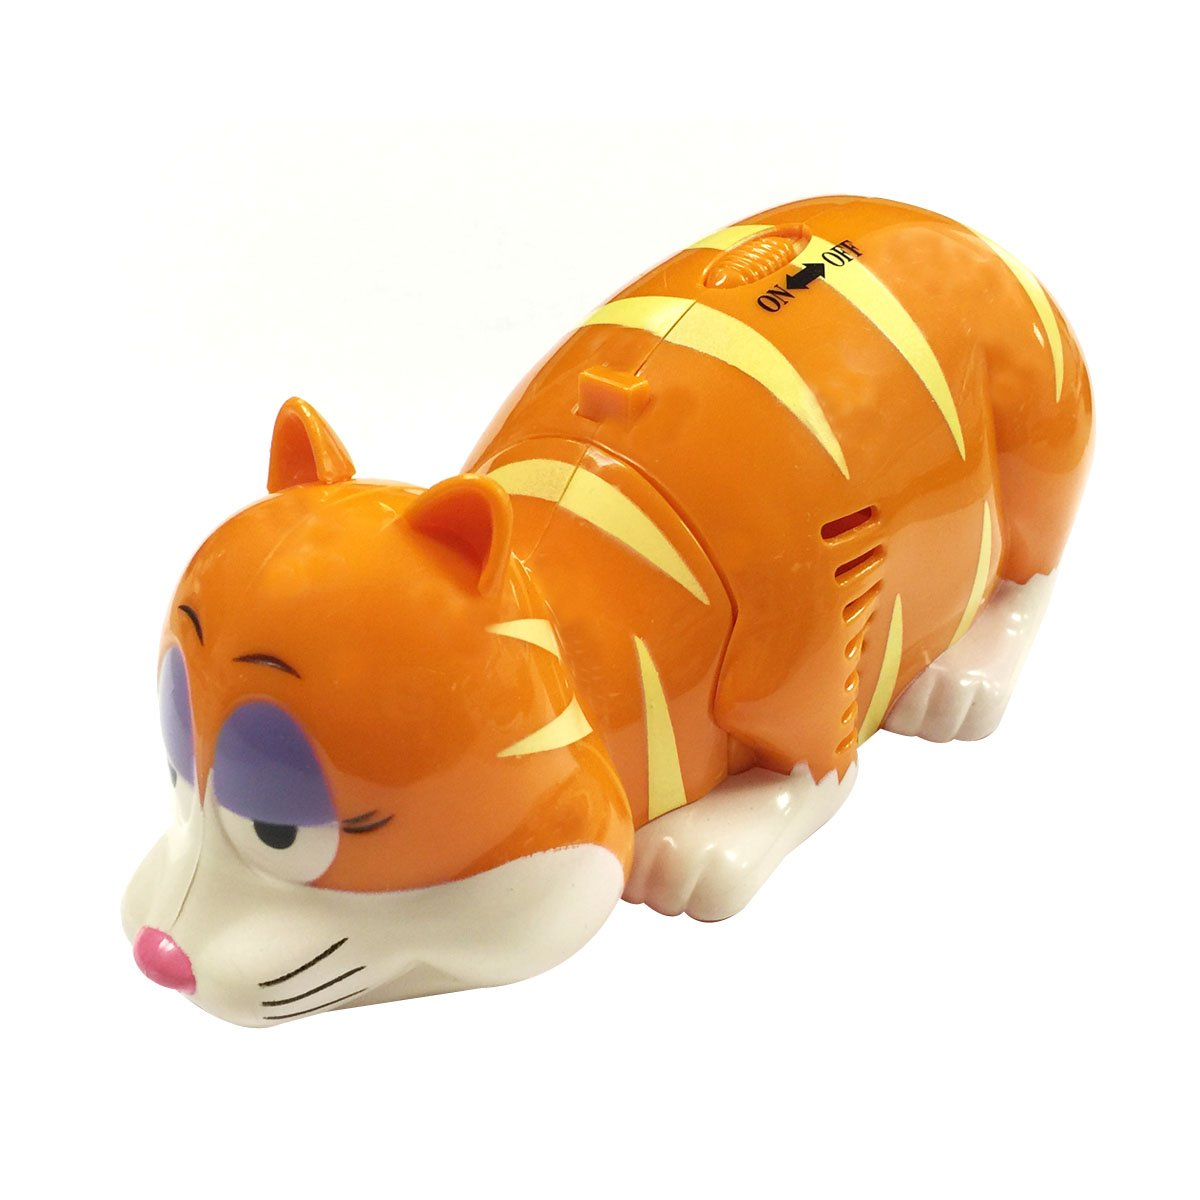 Wrapables Animal Mini Tabletop Vacuum, Cat - Cordless